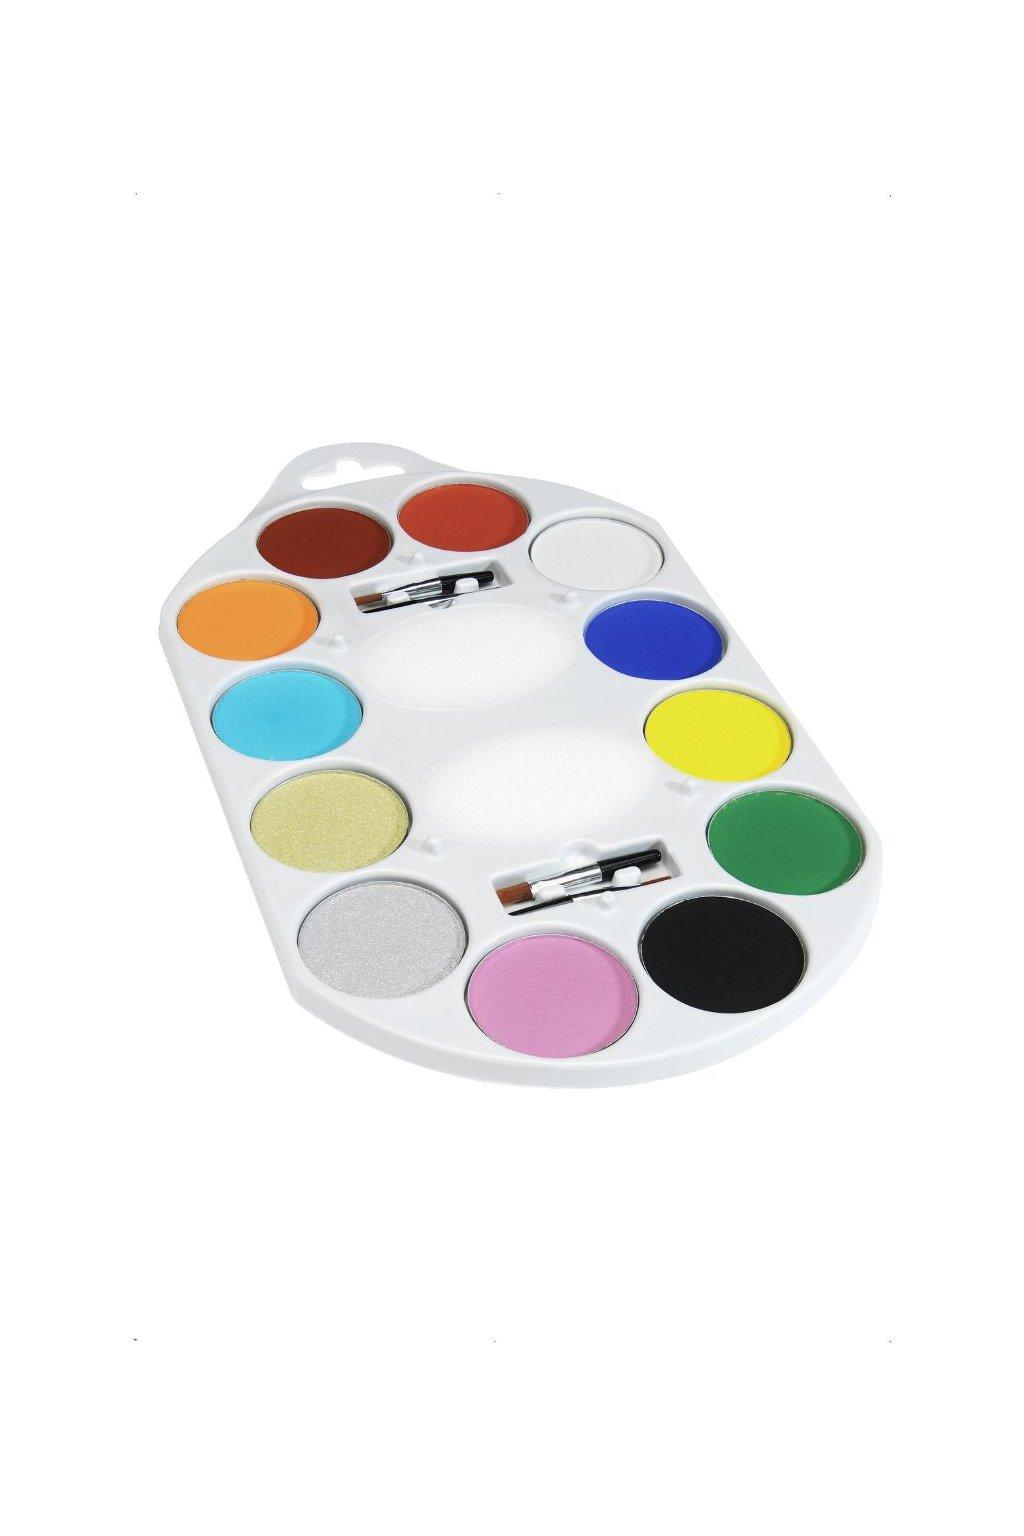 velká make-upová paleta 12 barev